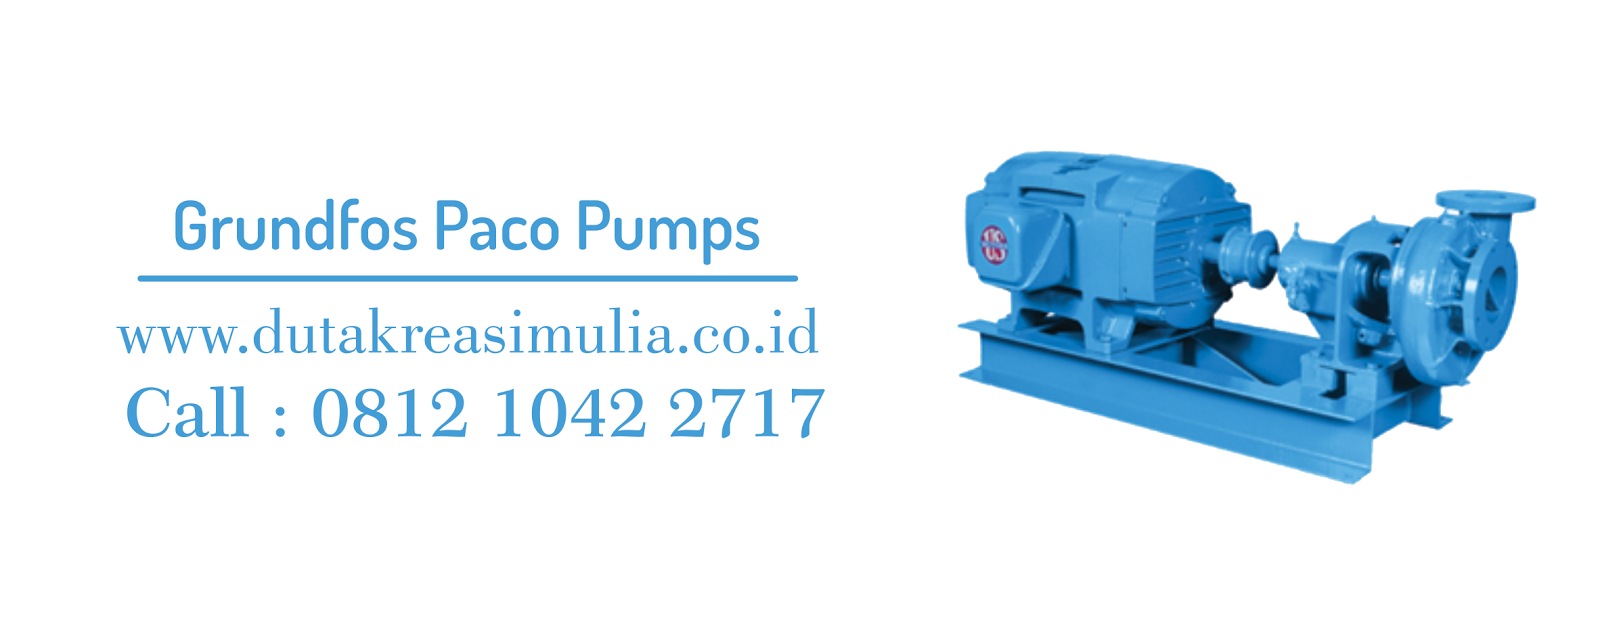 Distributor Pompa Industri Grundfos Paco Centrifugal Pumps ...